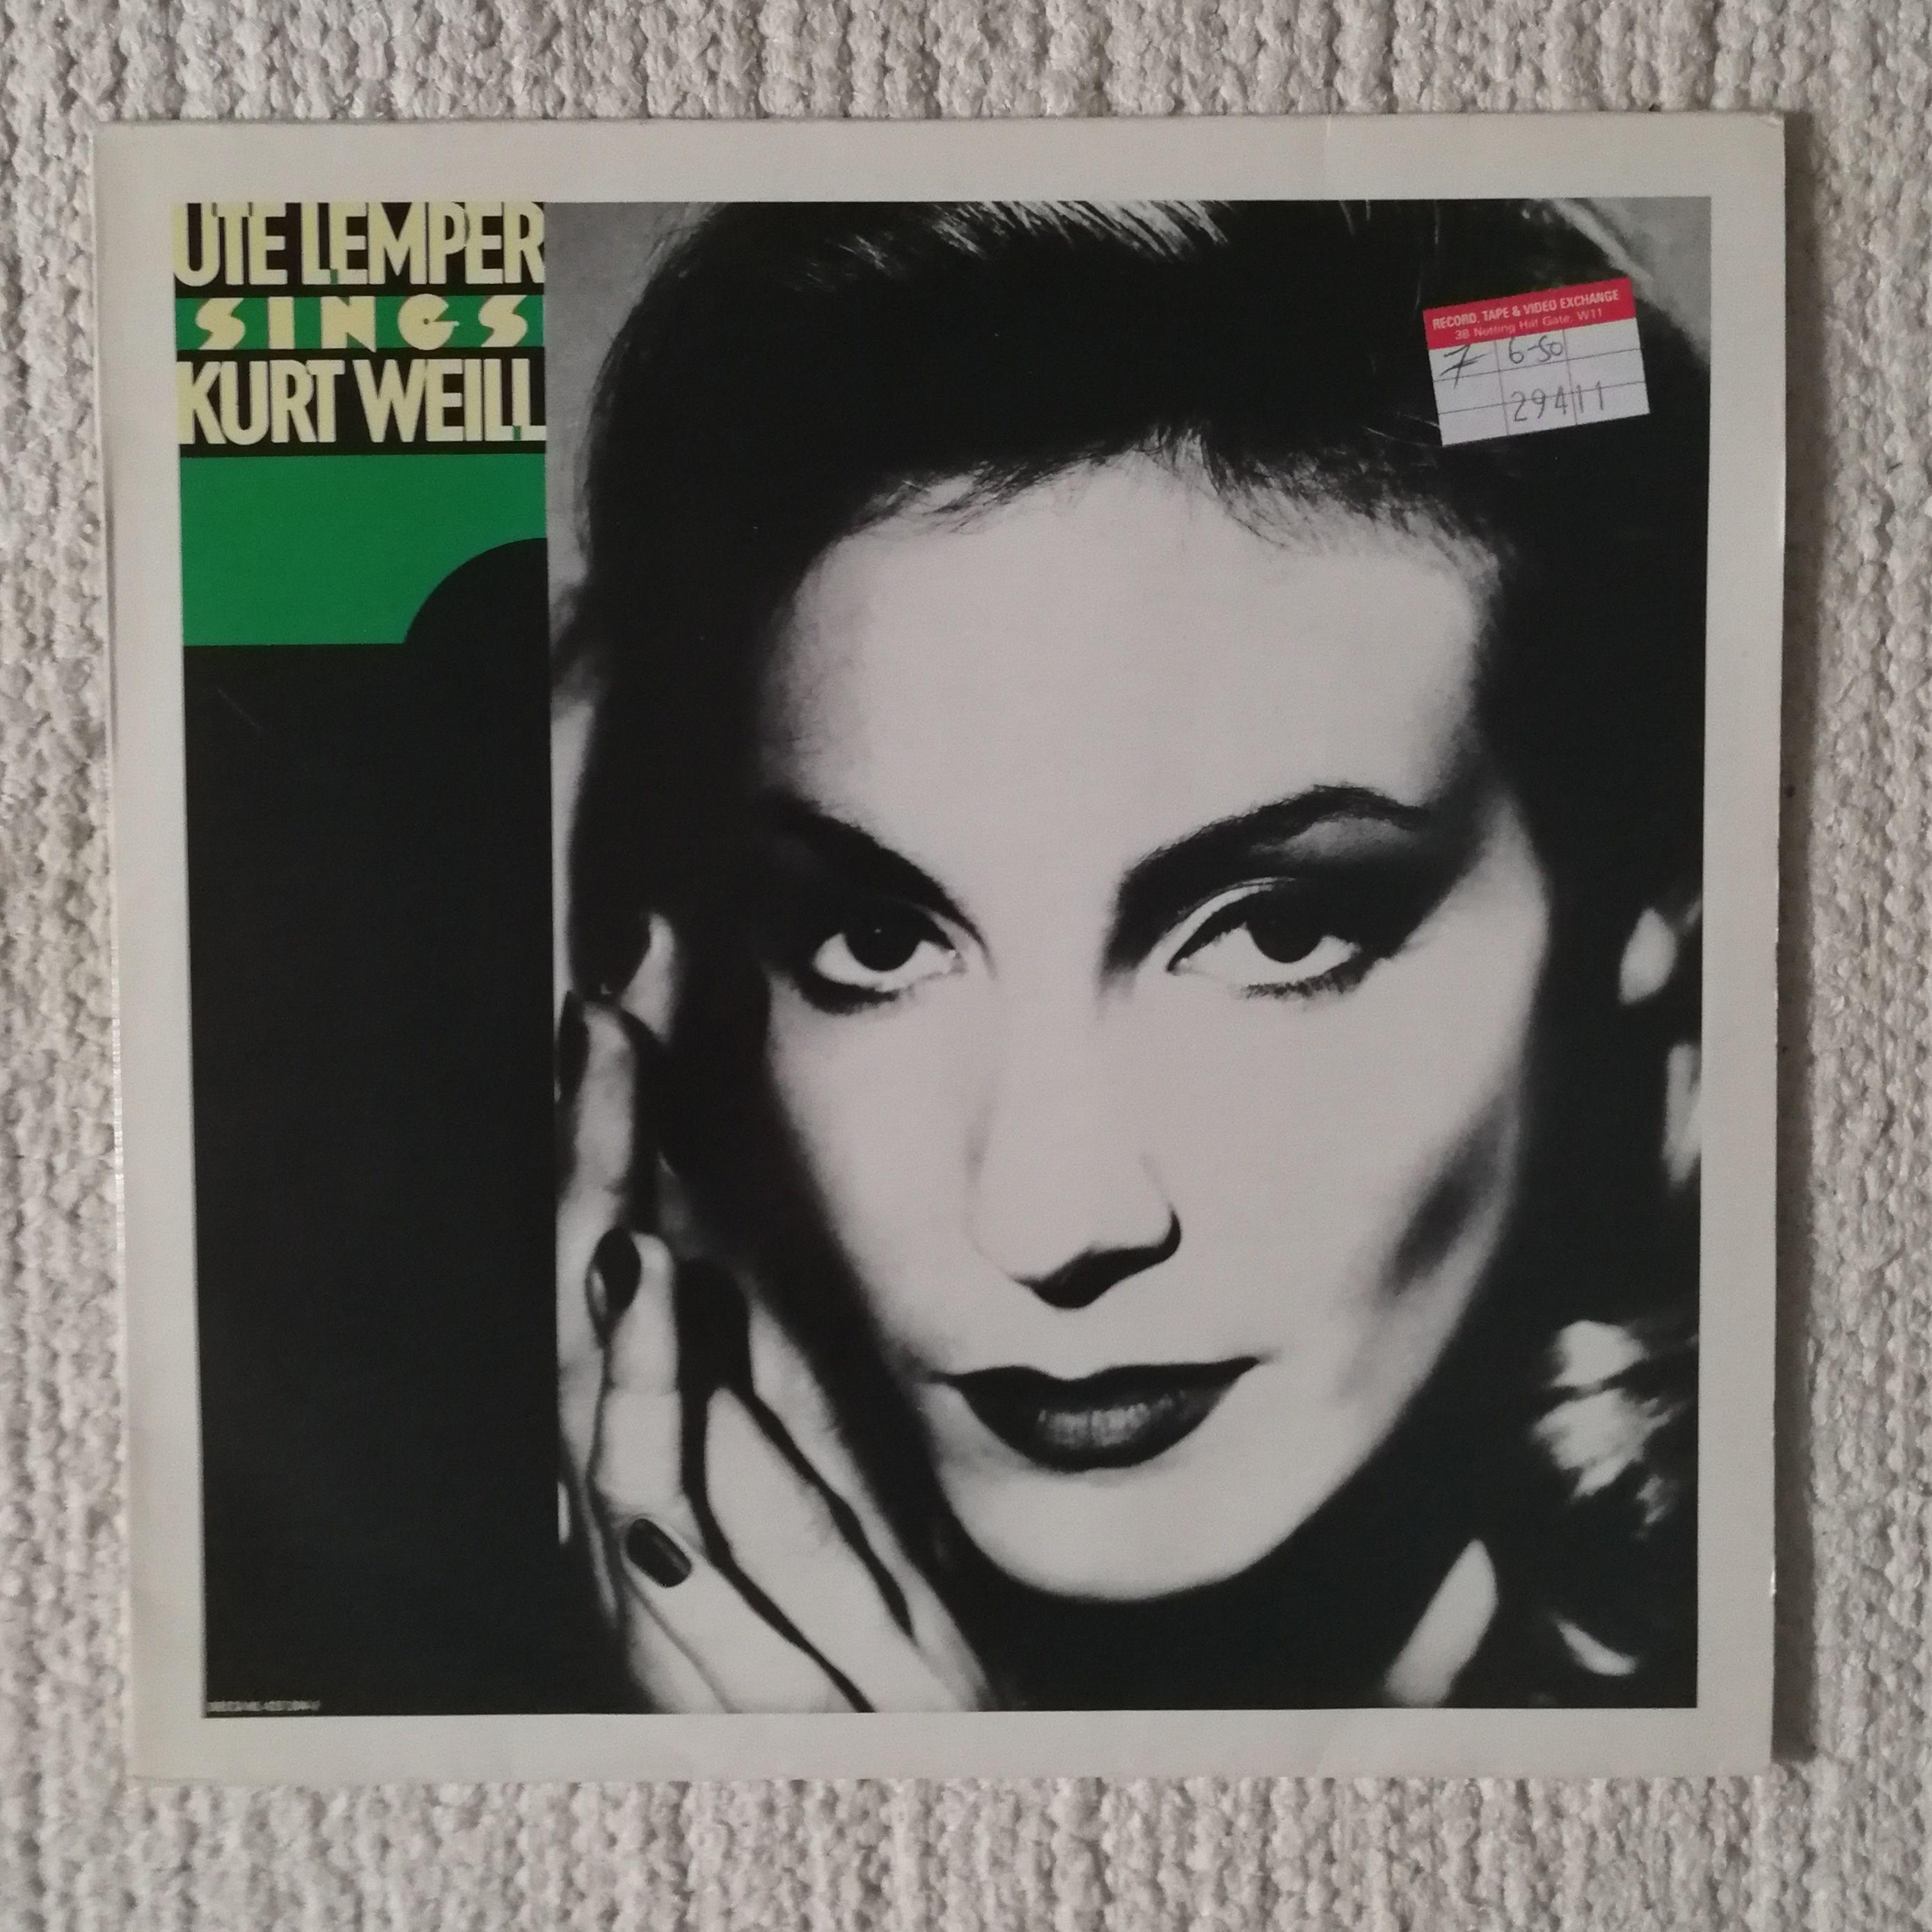 Ute Lemper Ute Lemper sings Kurt Weill LP undefined